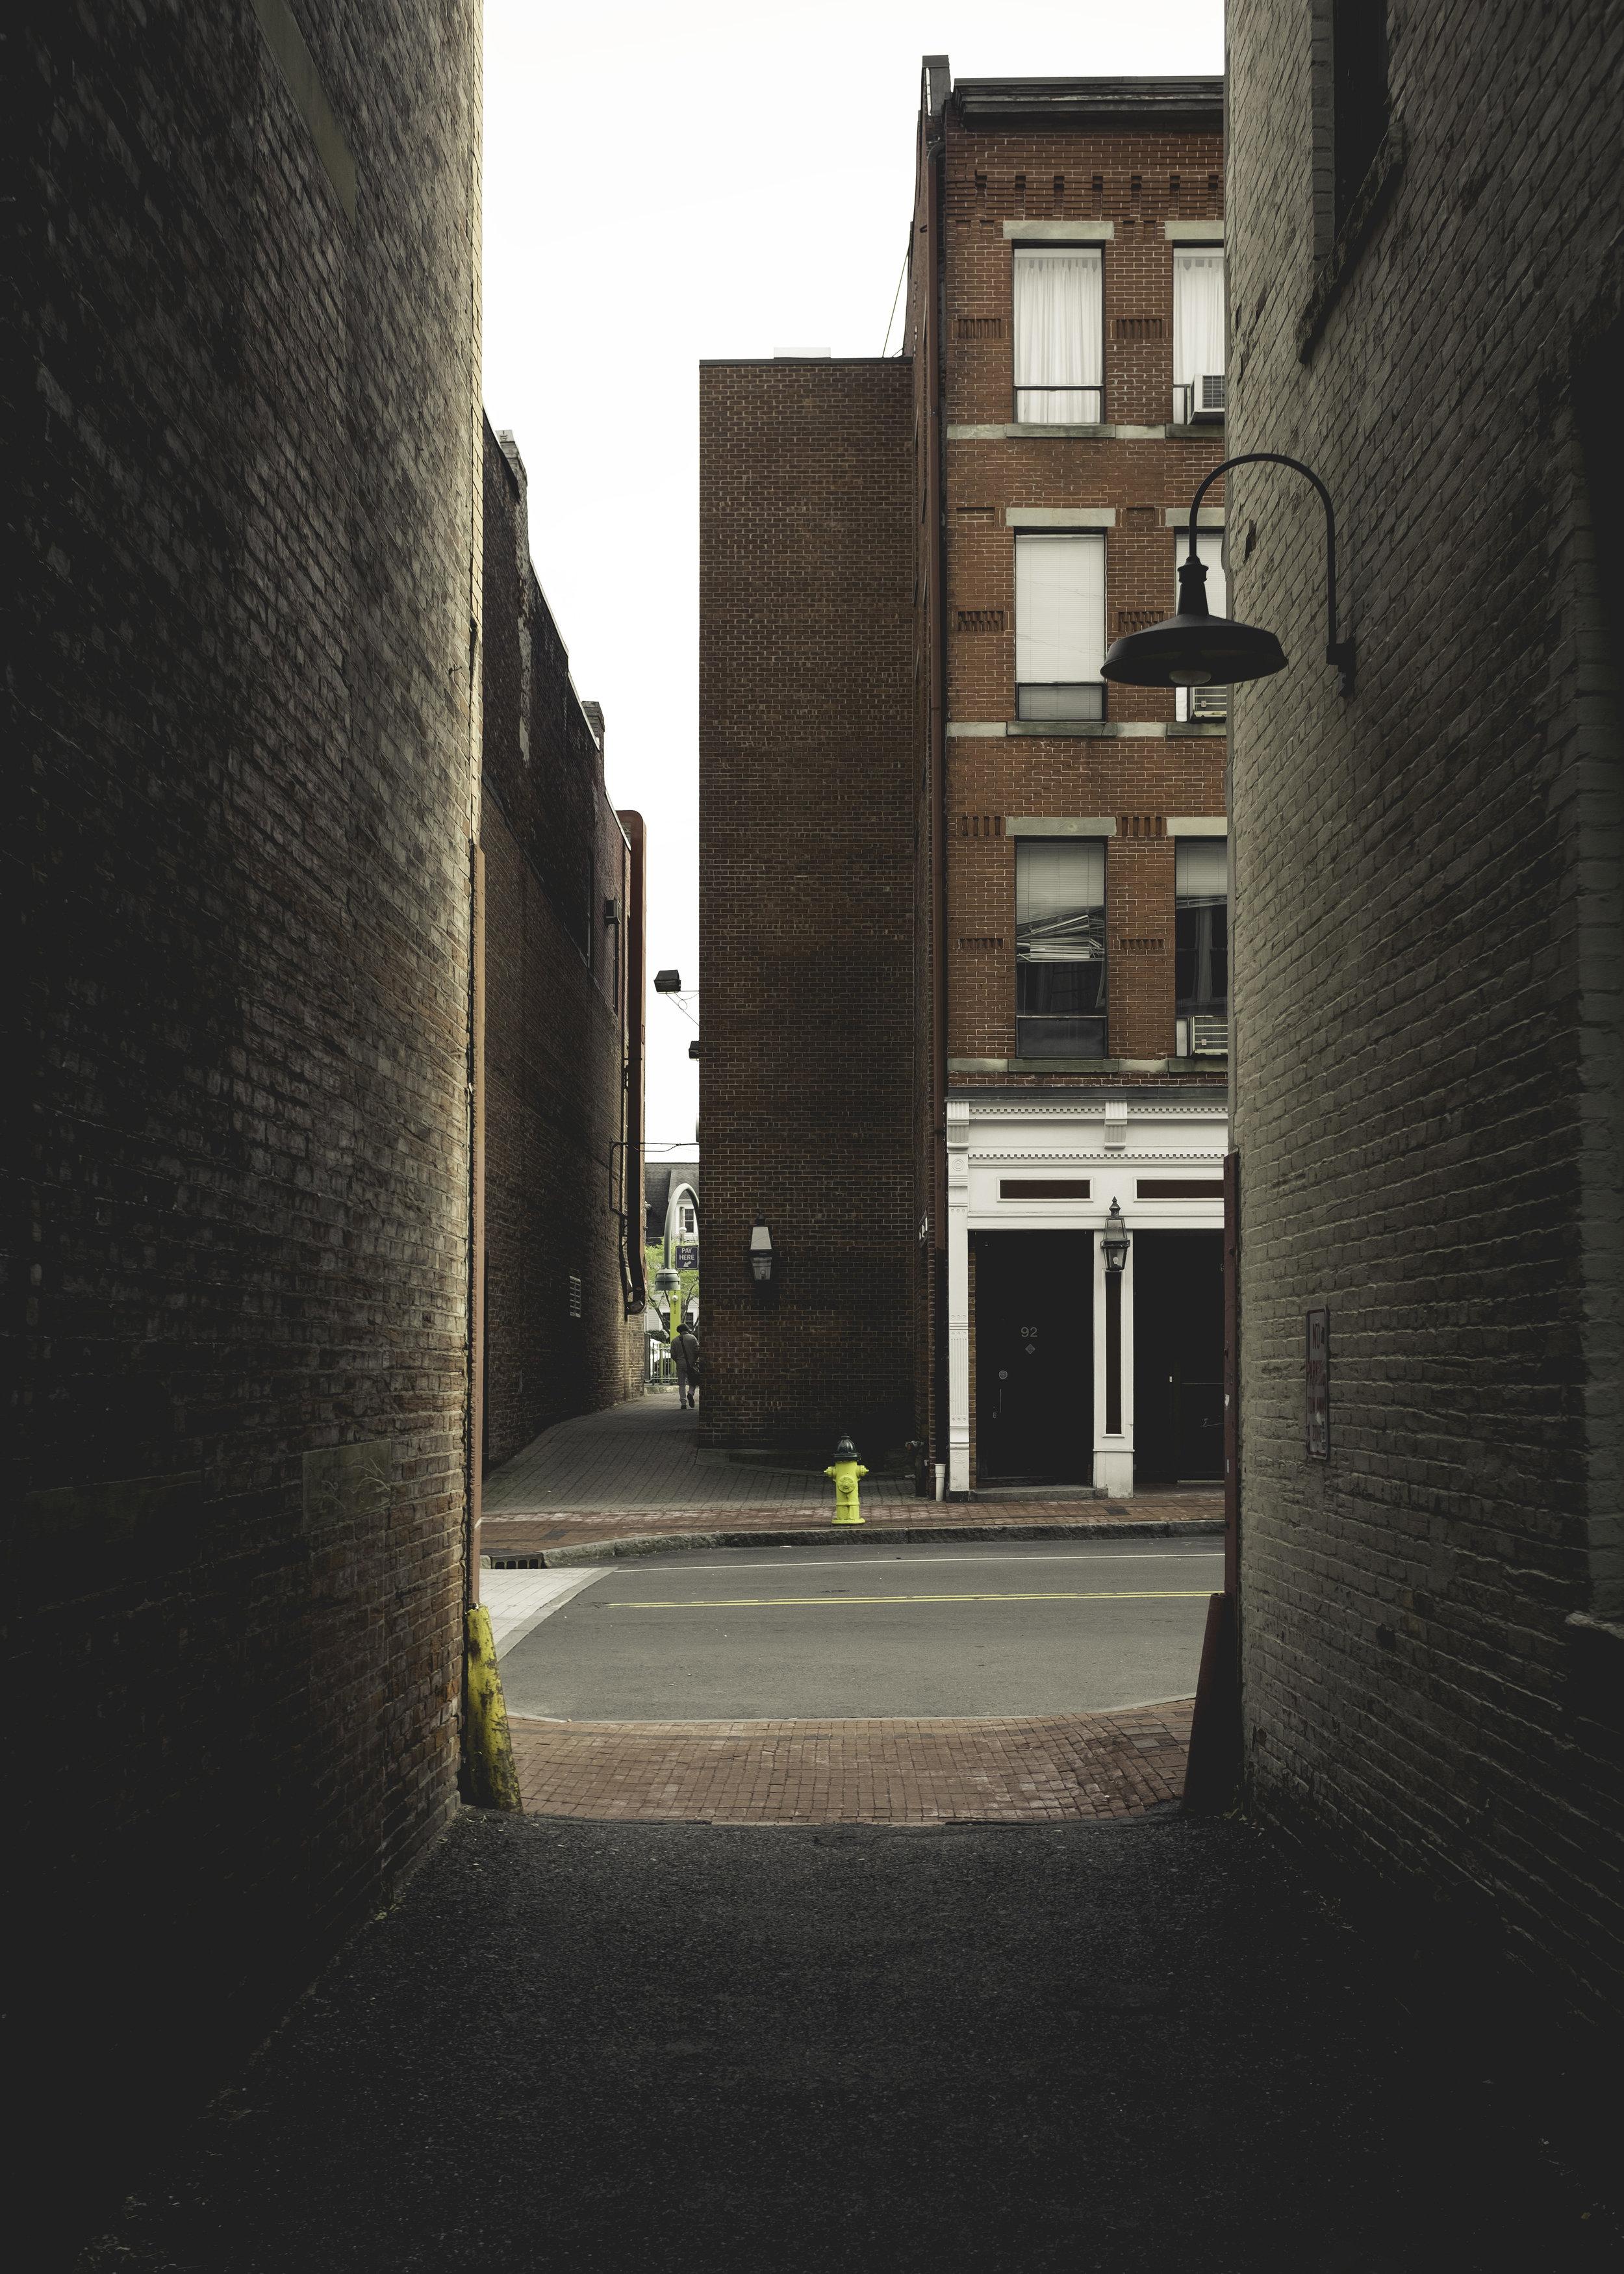 Alley Way NB.jpg